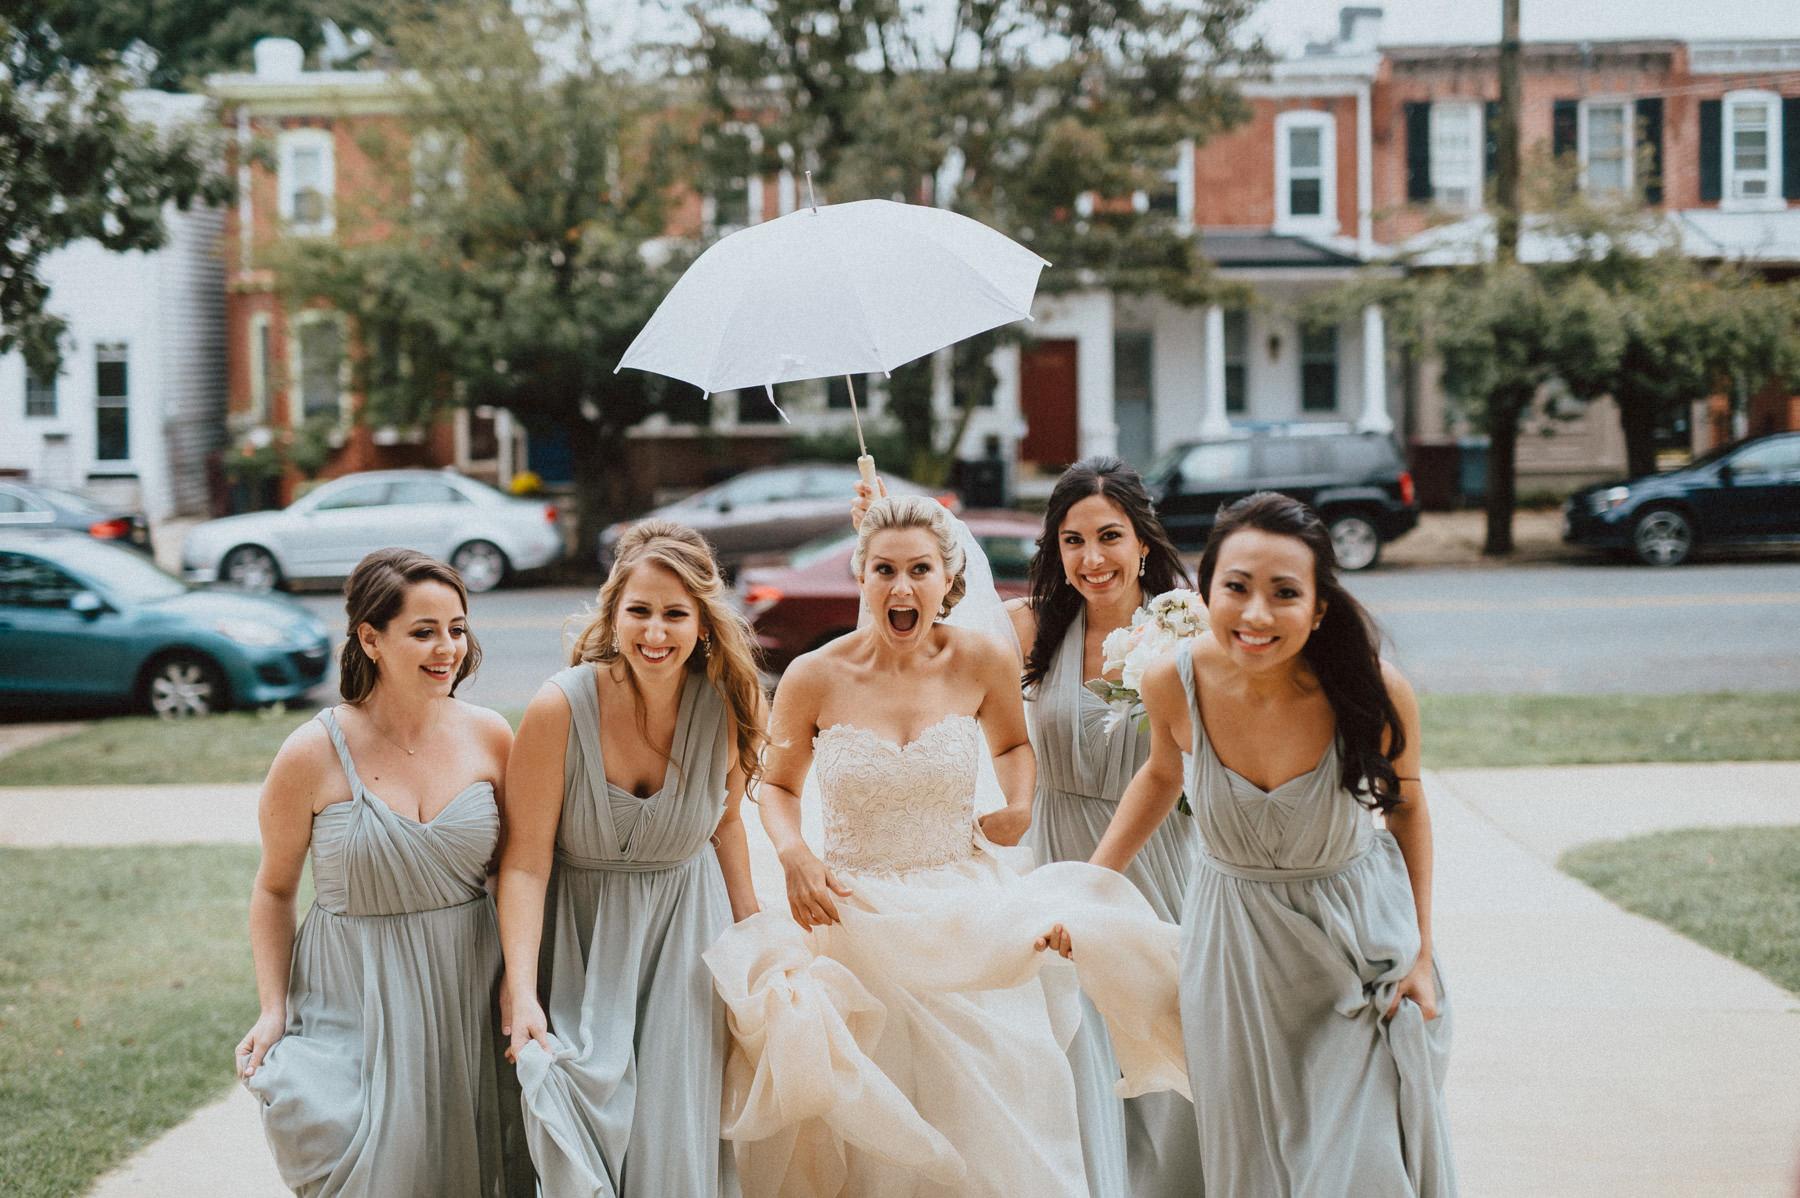 150-greenville-country-club-wedding-5-2.jpg